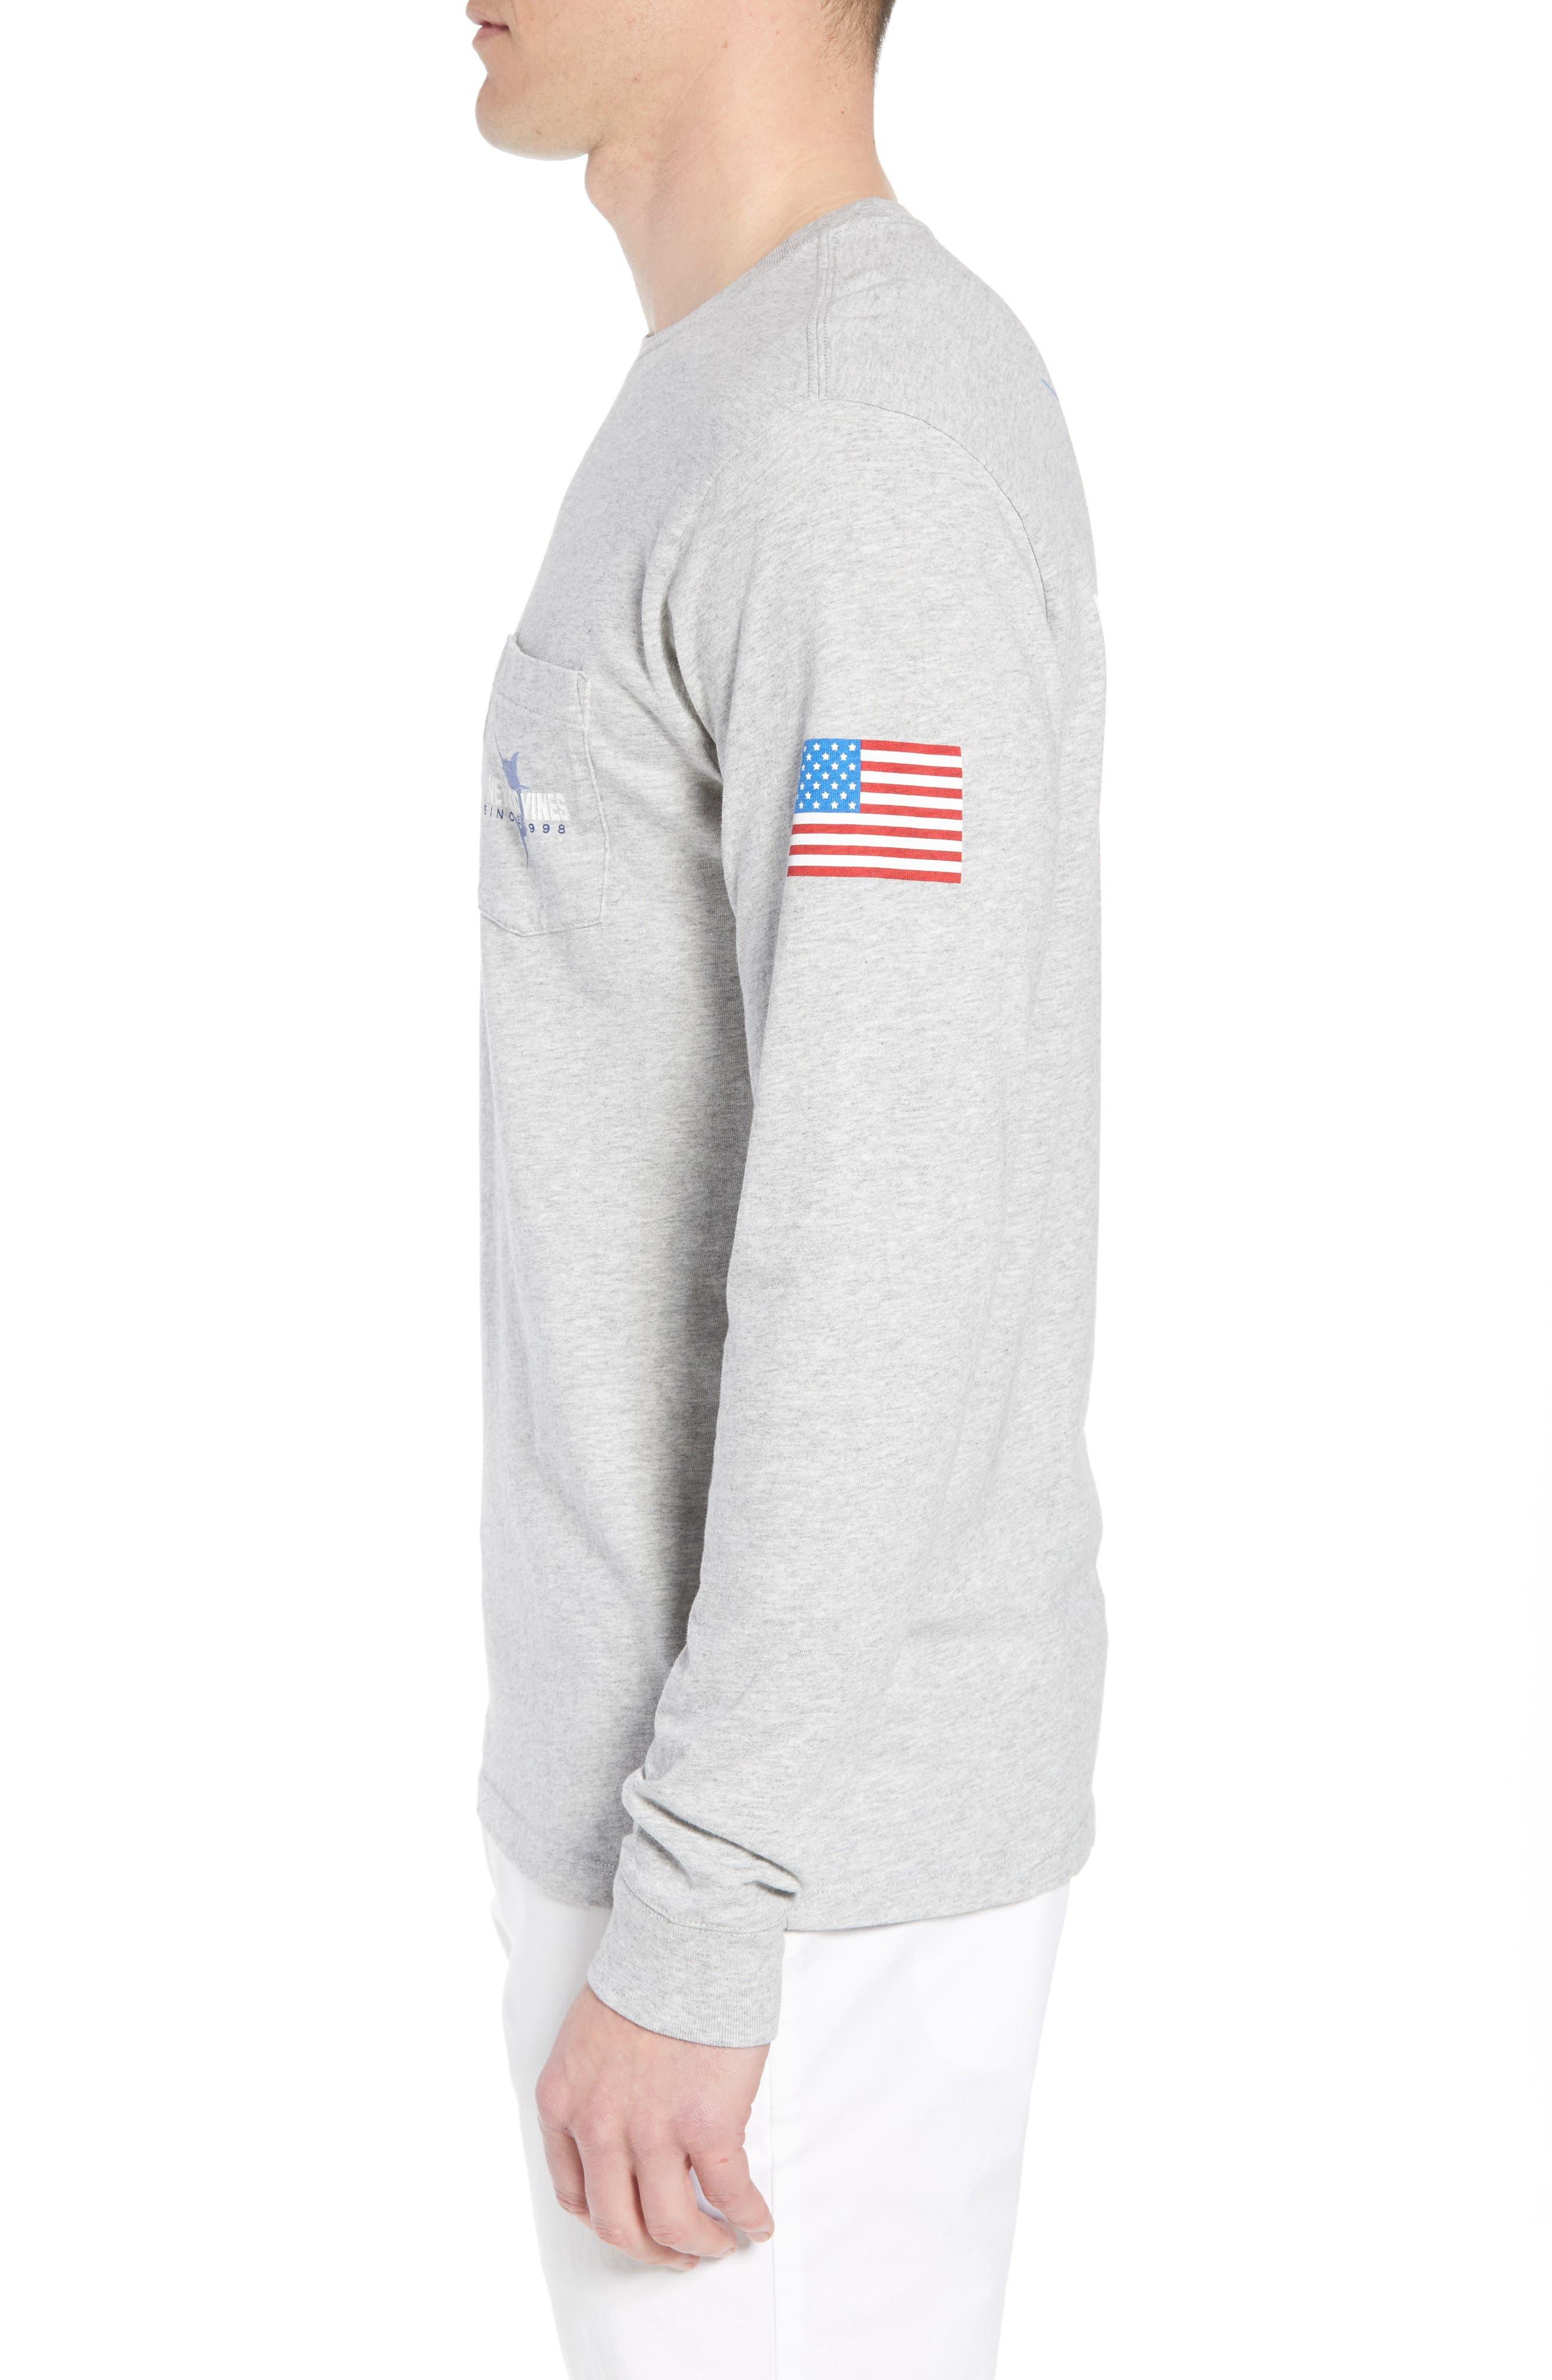 Marlin 98 Long Sleeve Pocket T-Shirt,                             Alternate thumbnail 3, color,                             Gray Heather